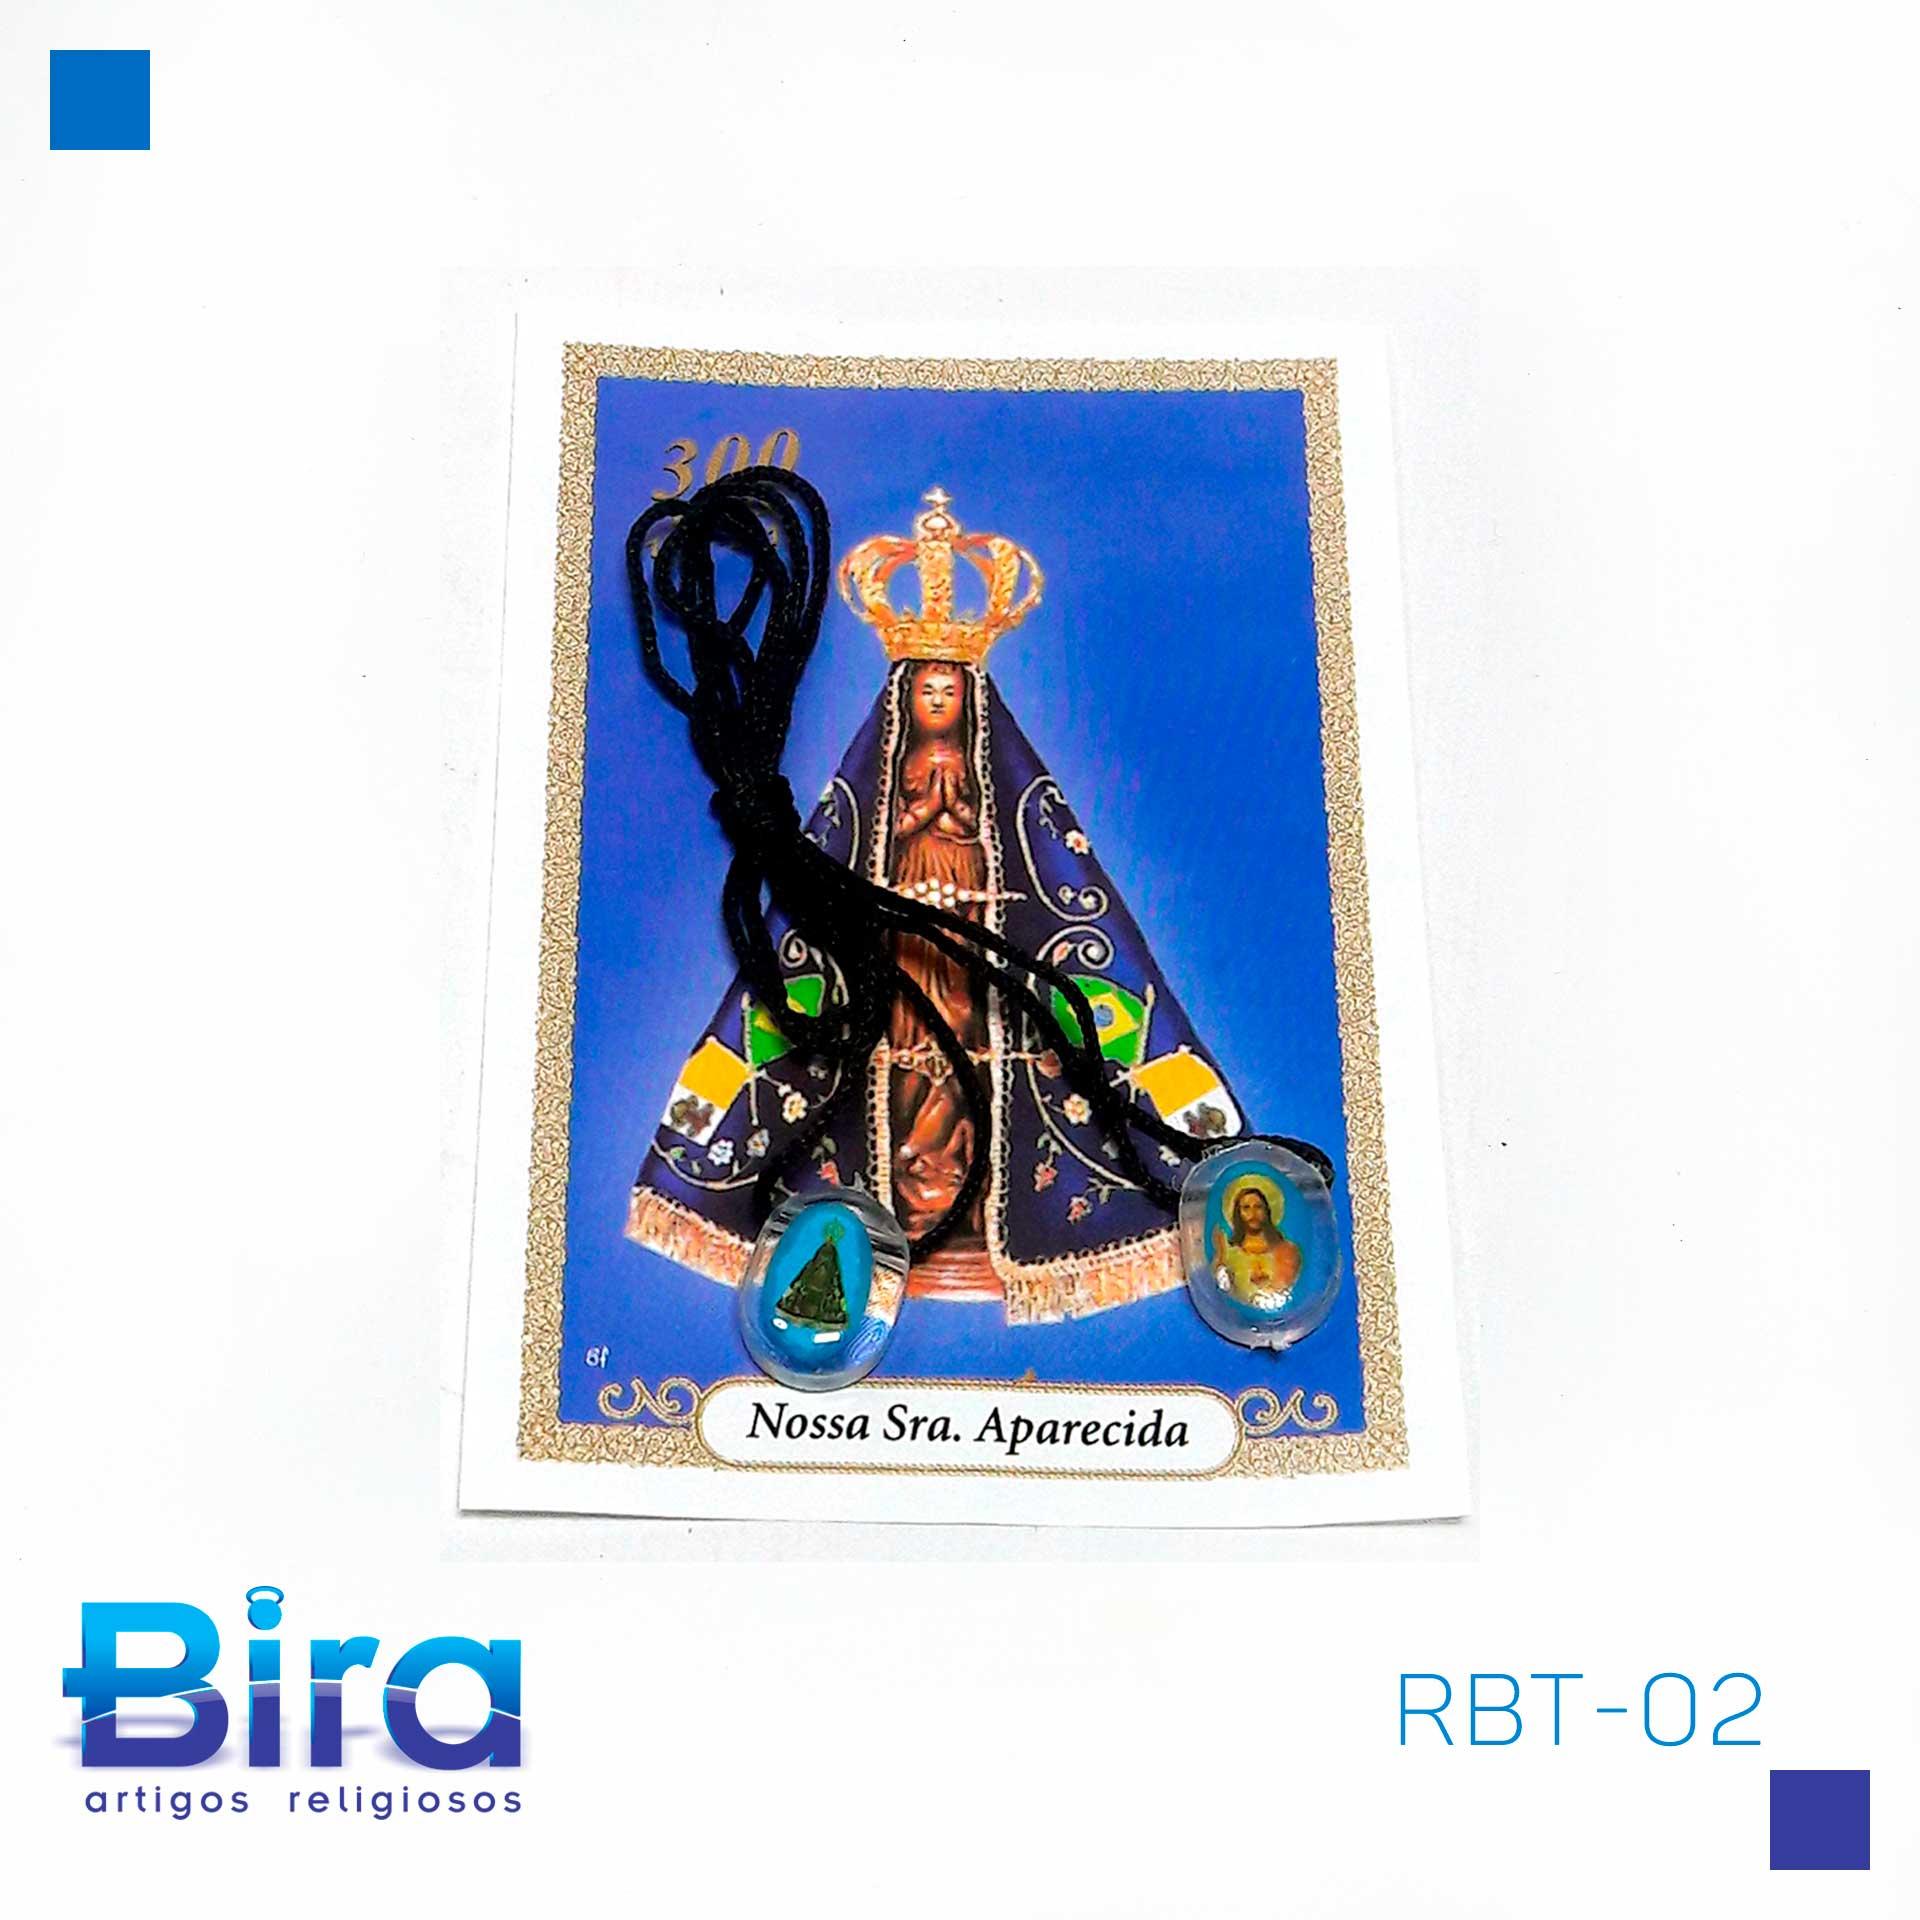 Bira Artigos Religiosos - ESCAPULARIO SANTOS DIVERSOS NV C/12 UNIDADES - CÓD. RBT-02